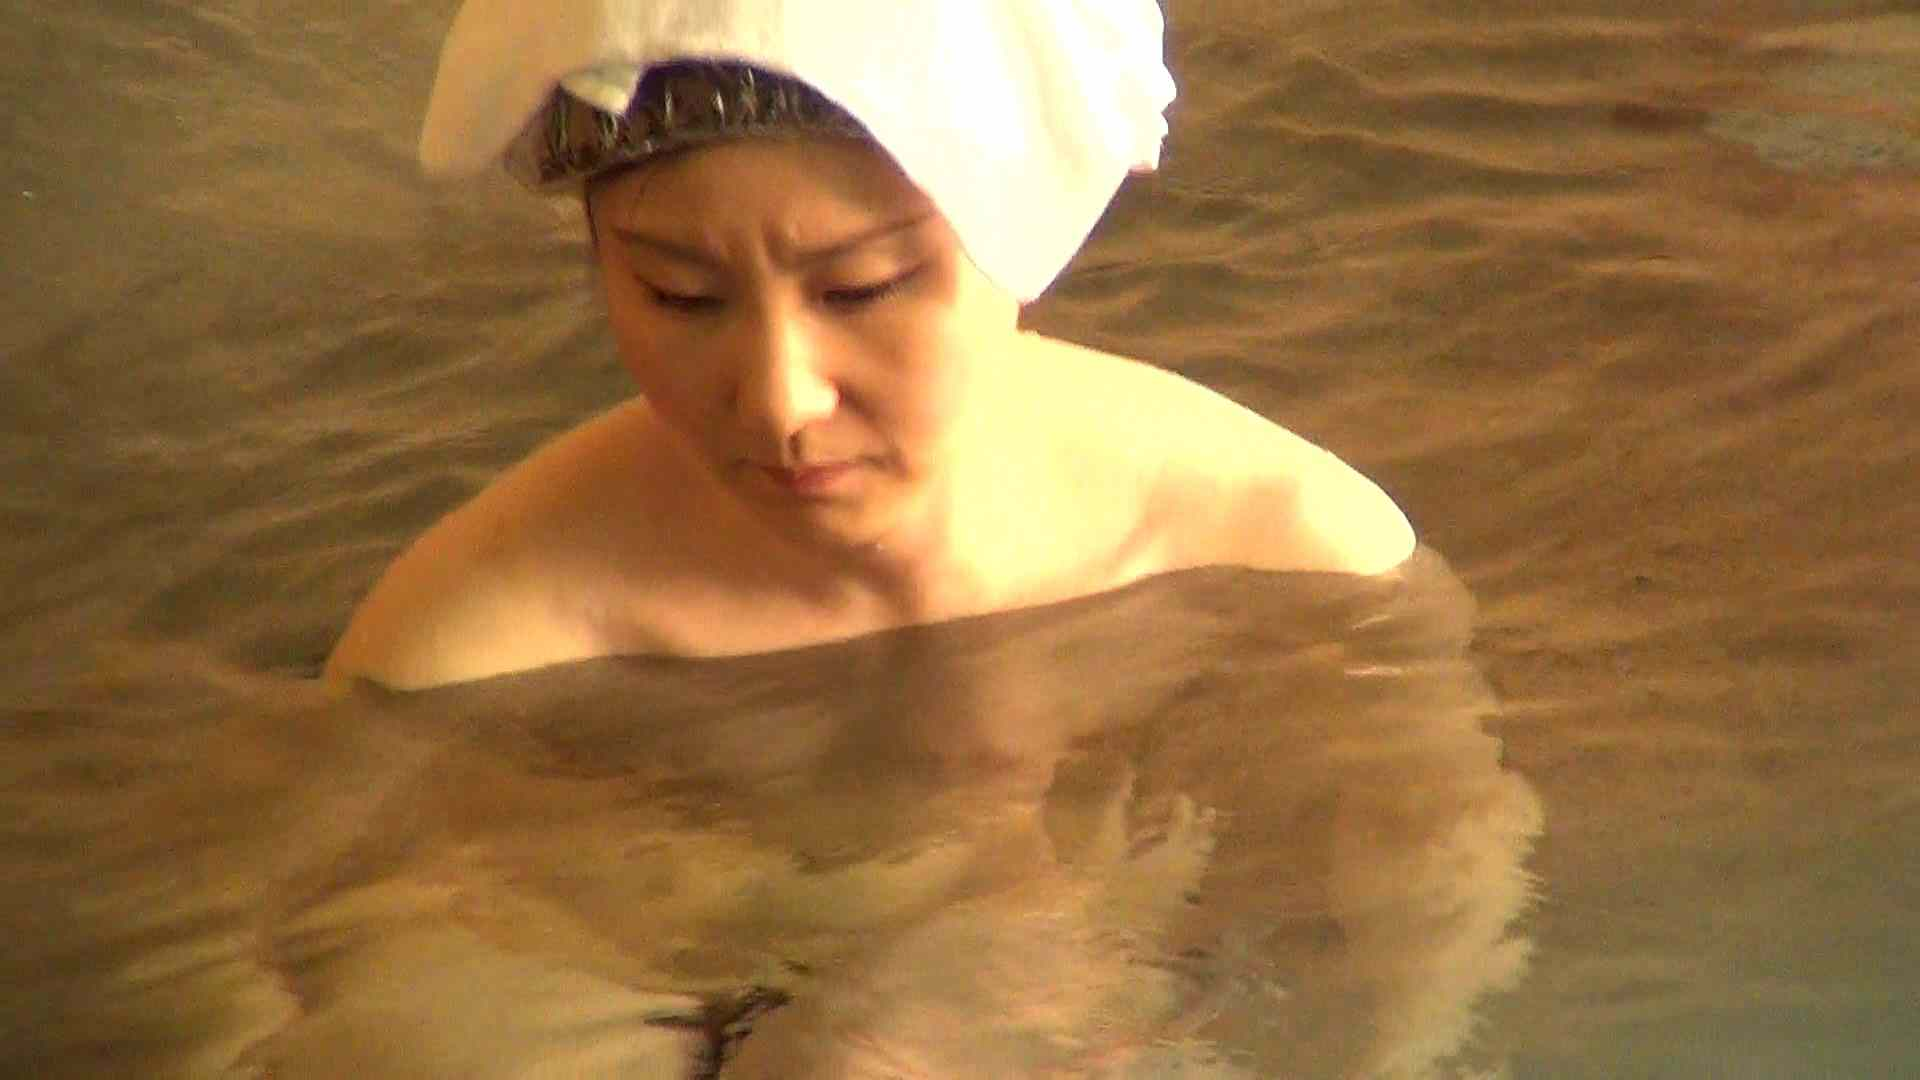 Aquaな露天風呂Vol.278 0  88連発 40